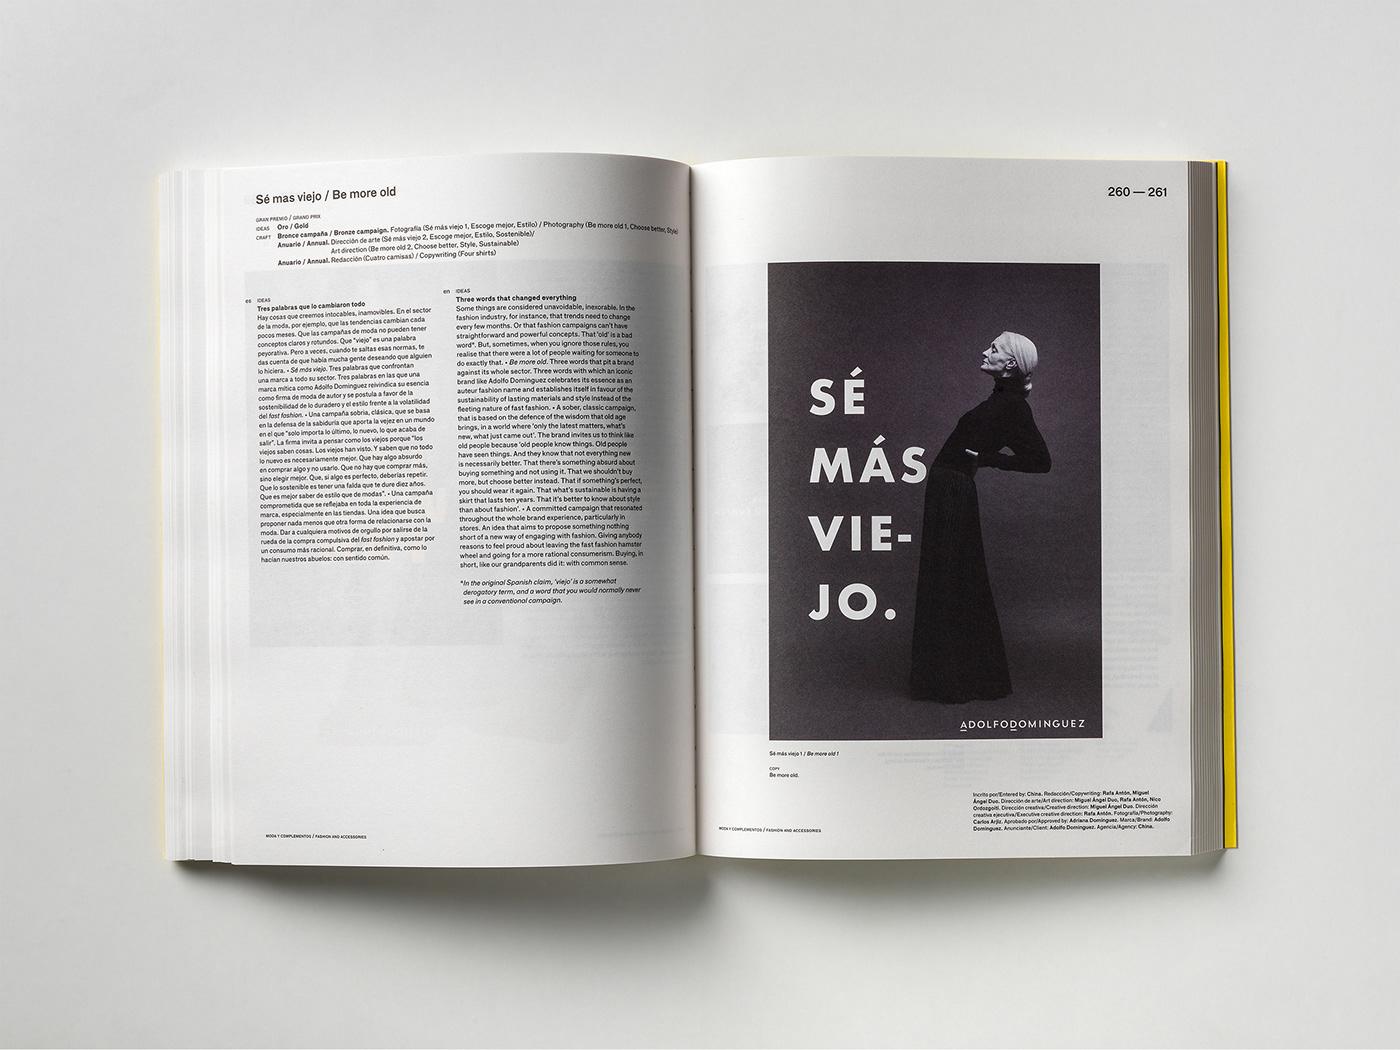 Advertiding book Creativity typography